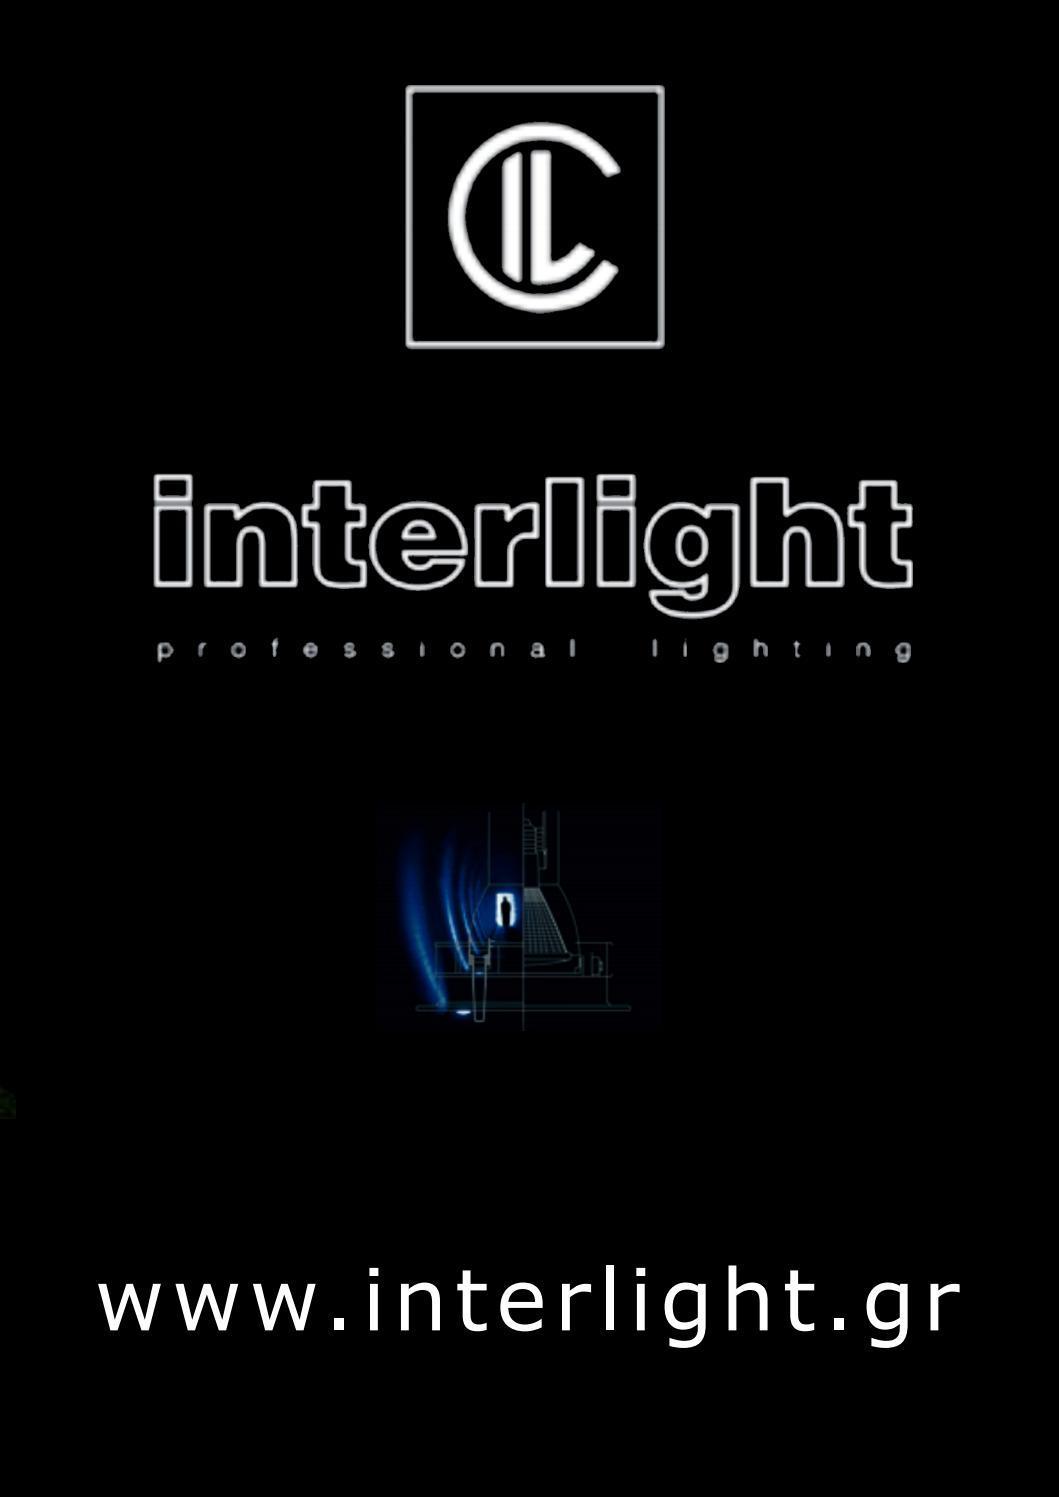 Inter light